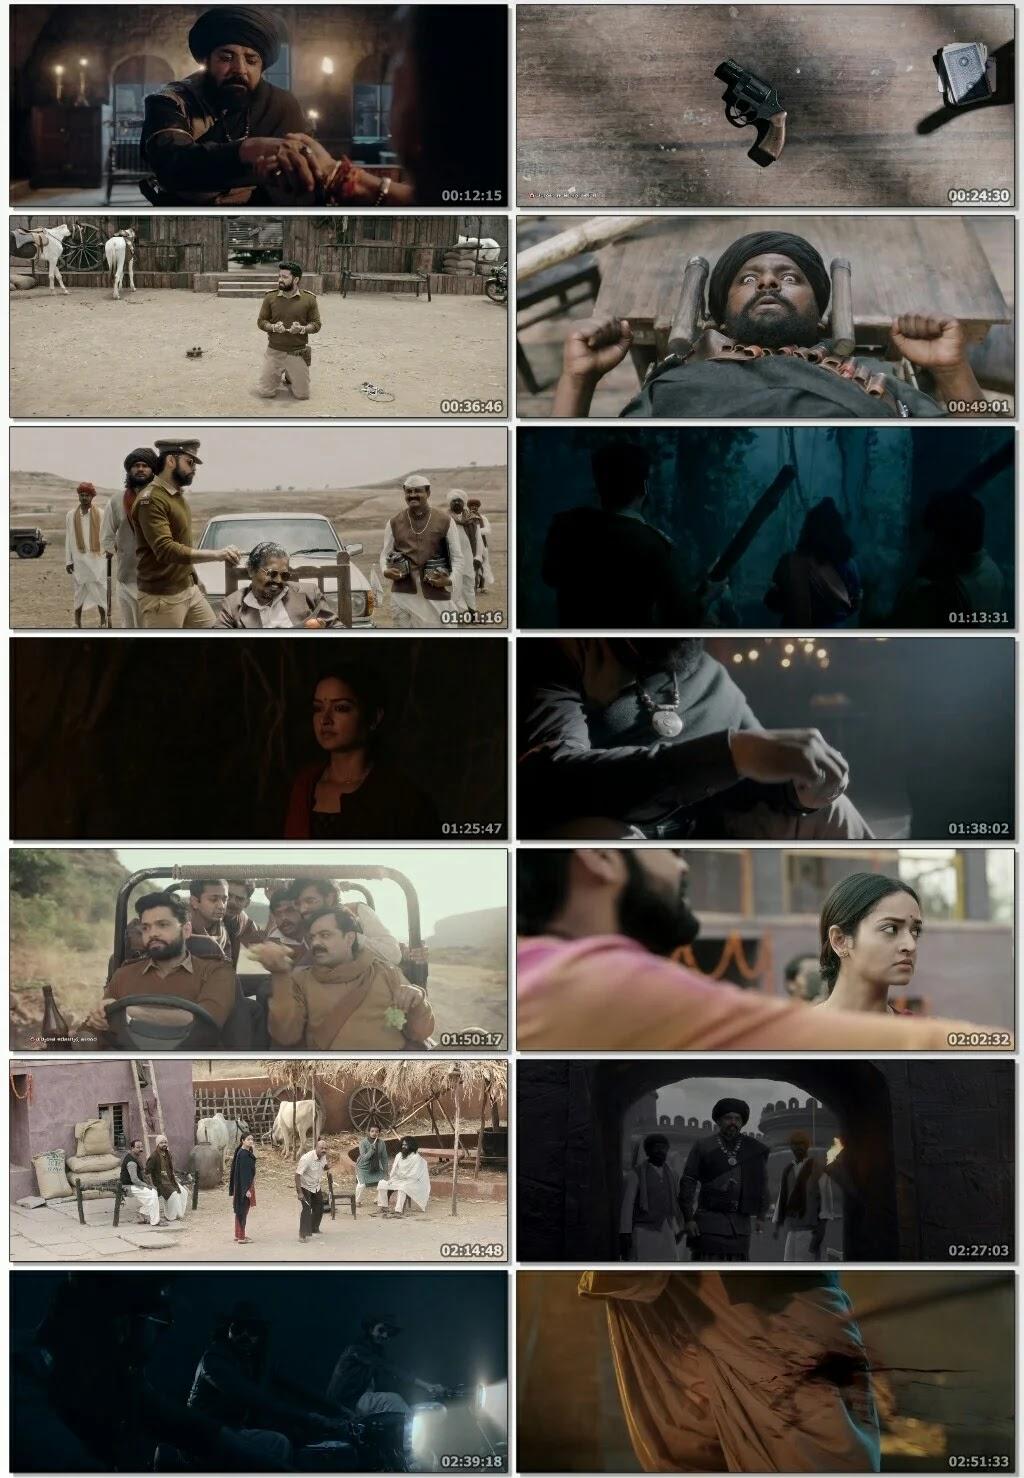 Avane Srimannarayana full movie download Openload